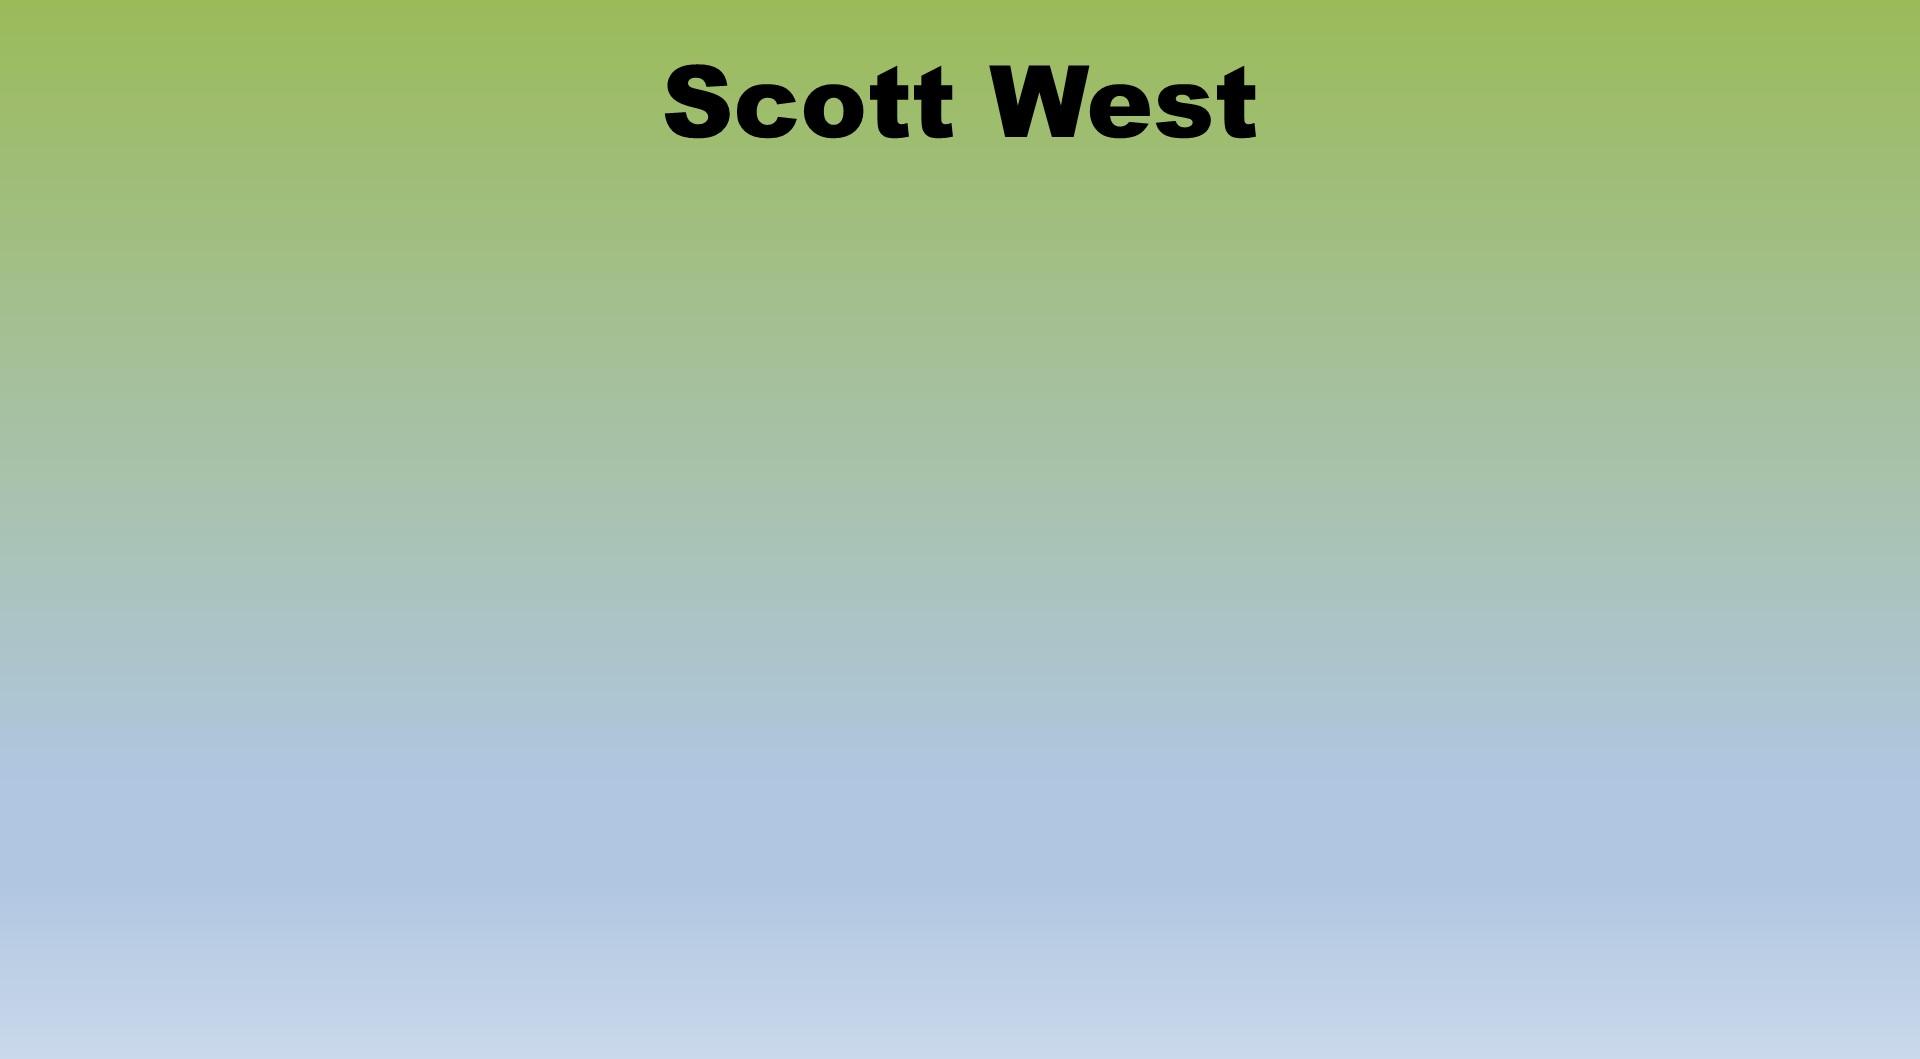 Scott West.jpg